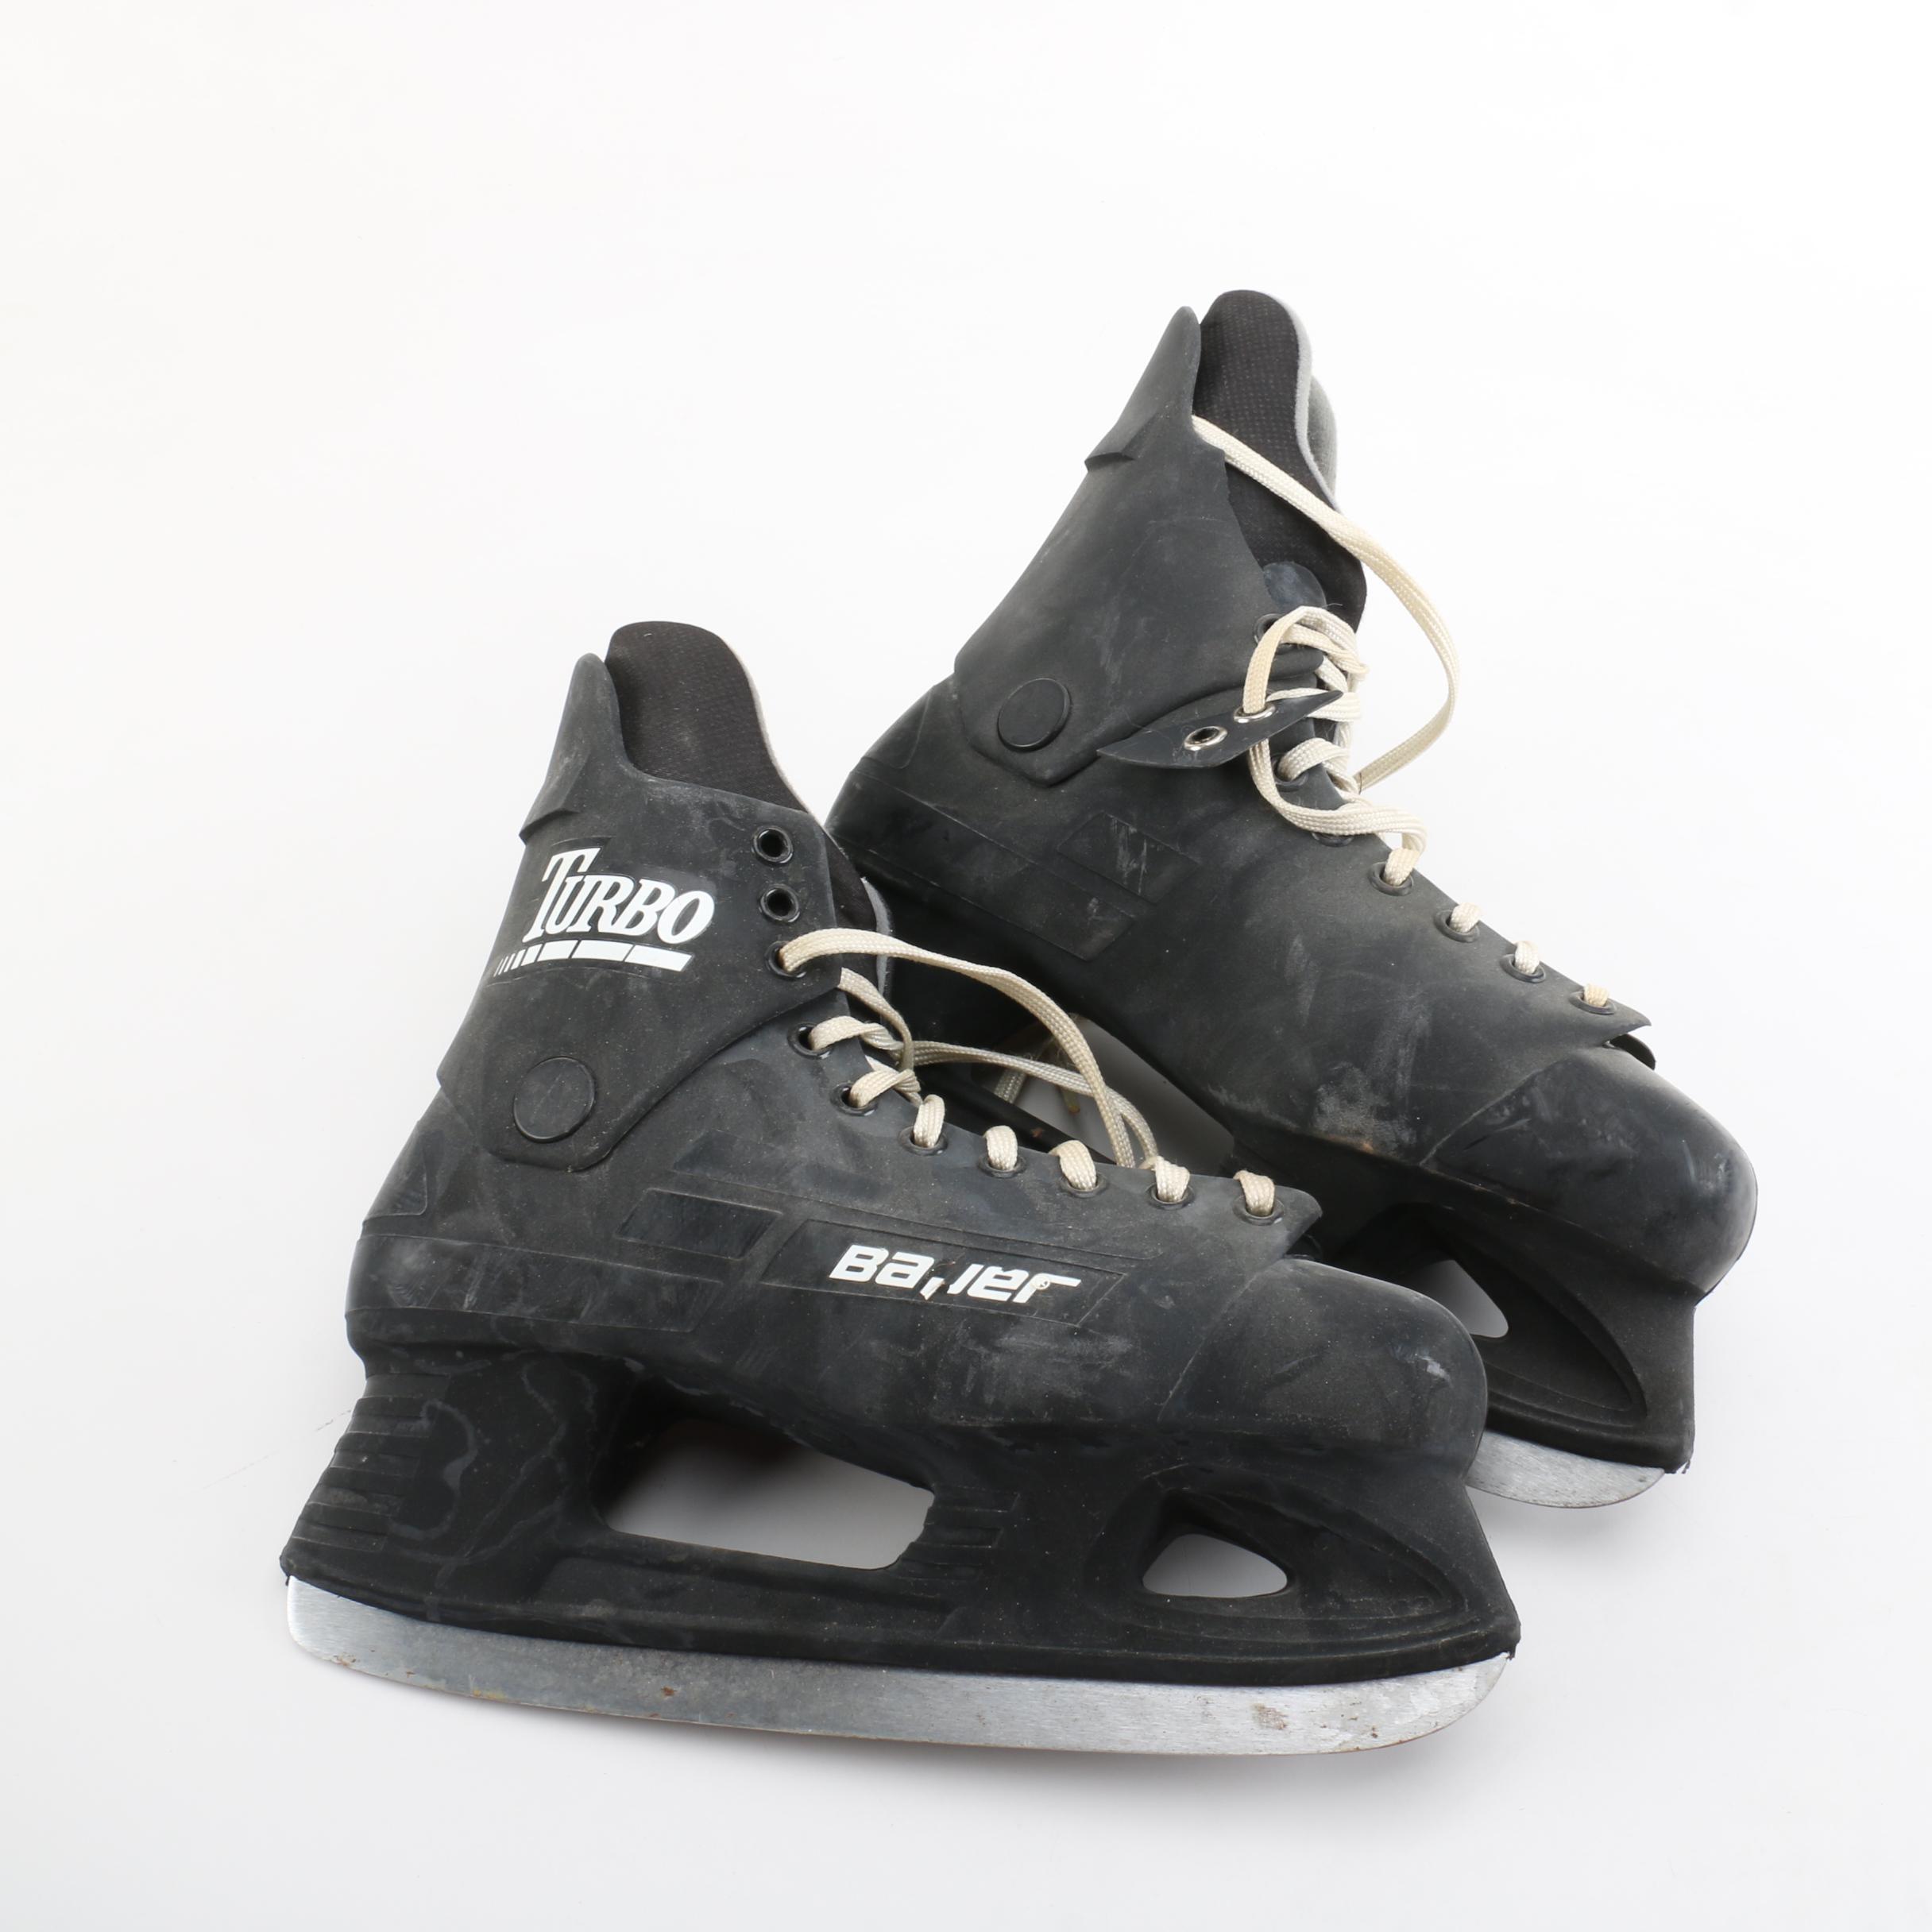 Bauer Turbo Ice Hockey Skates